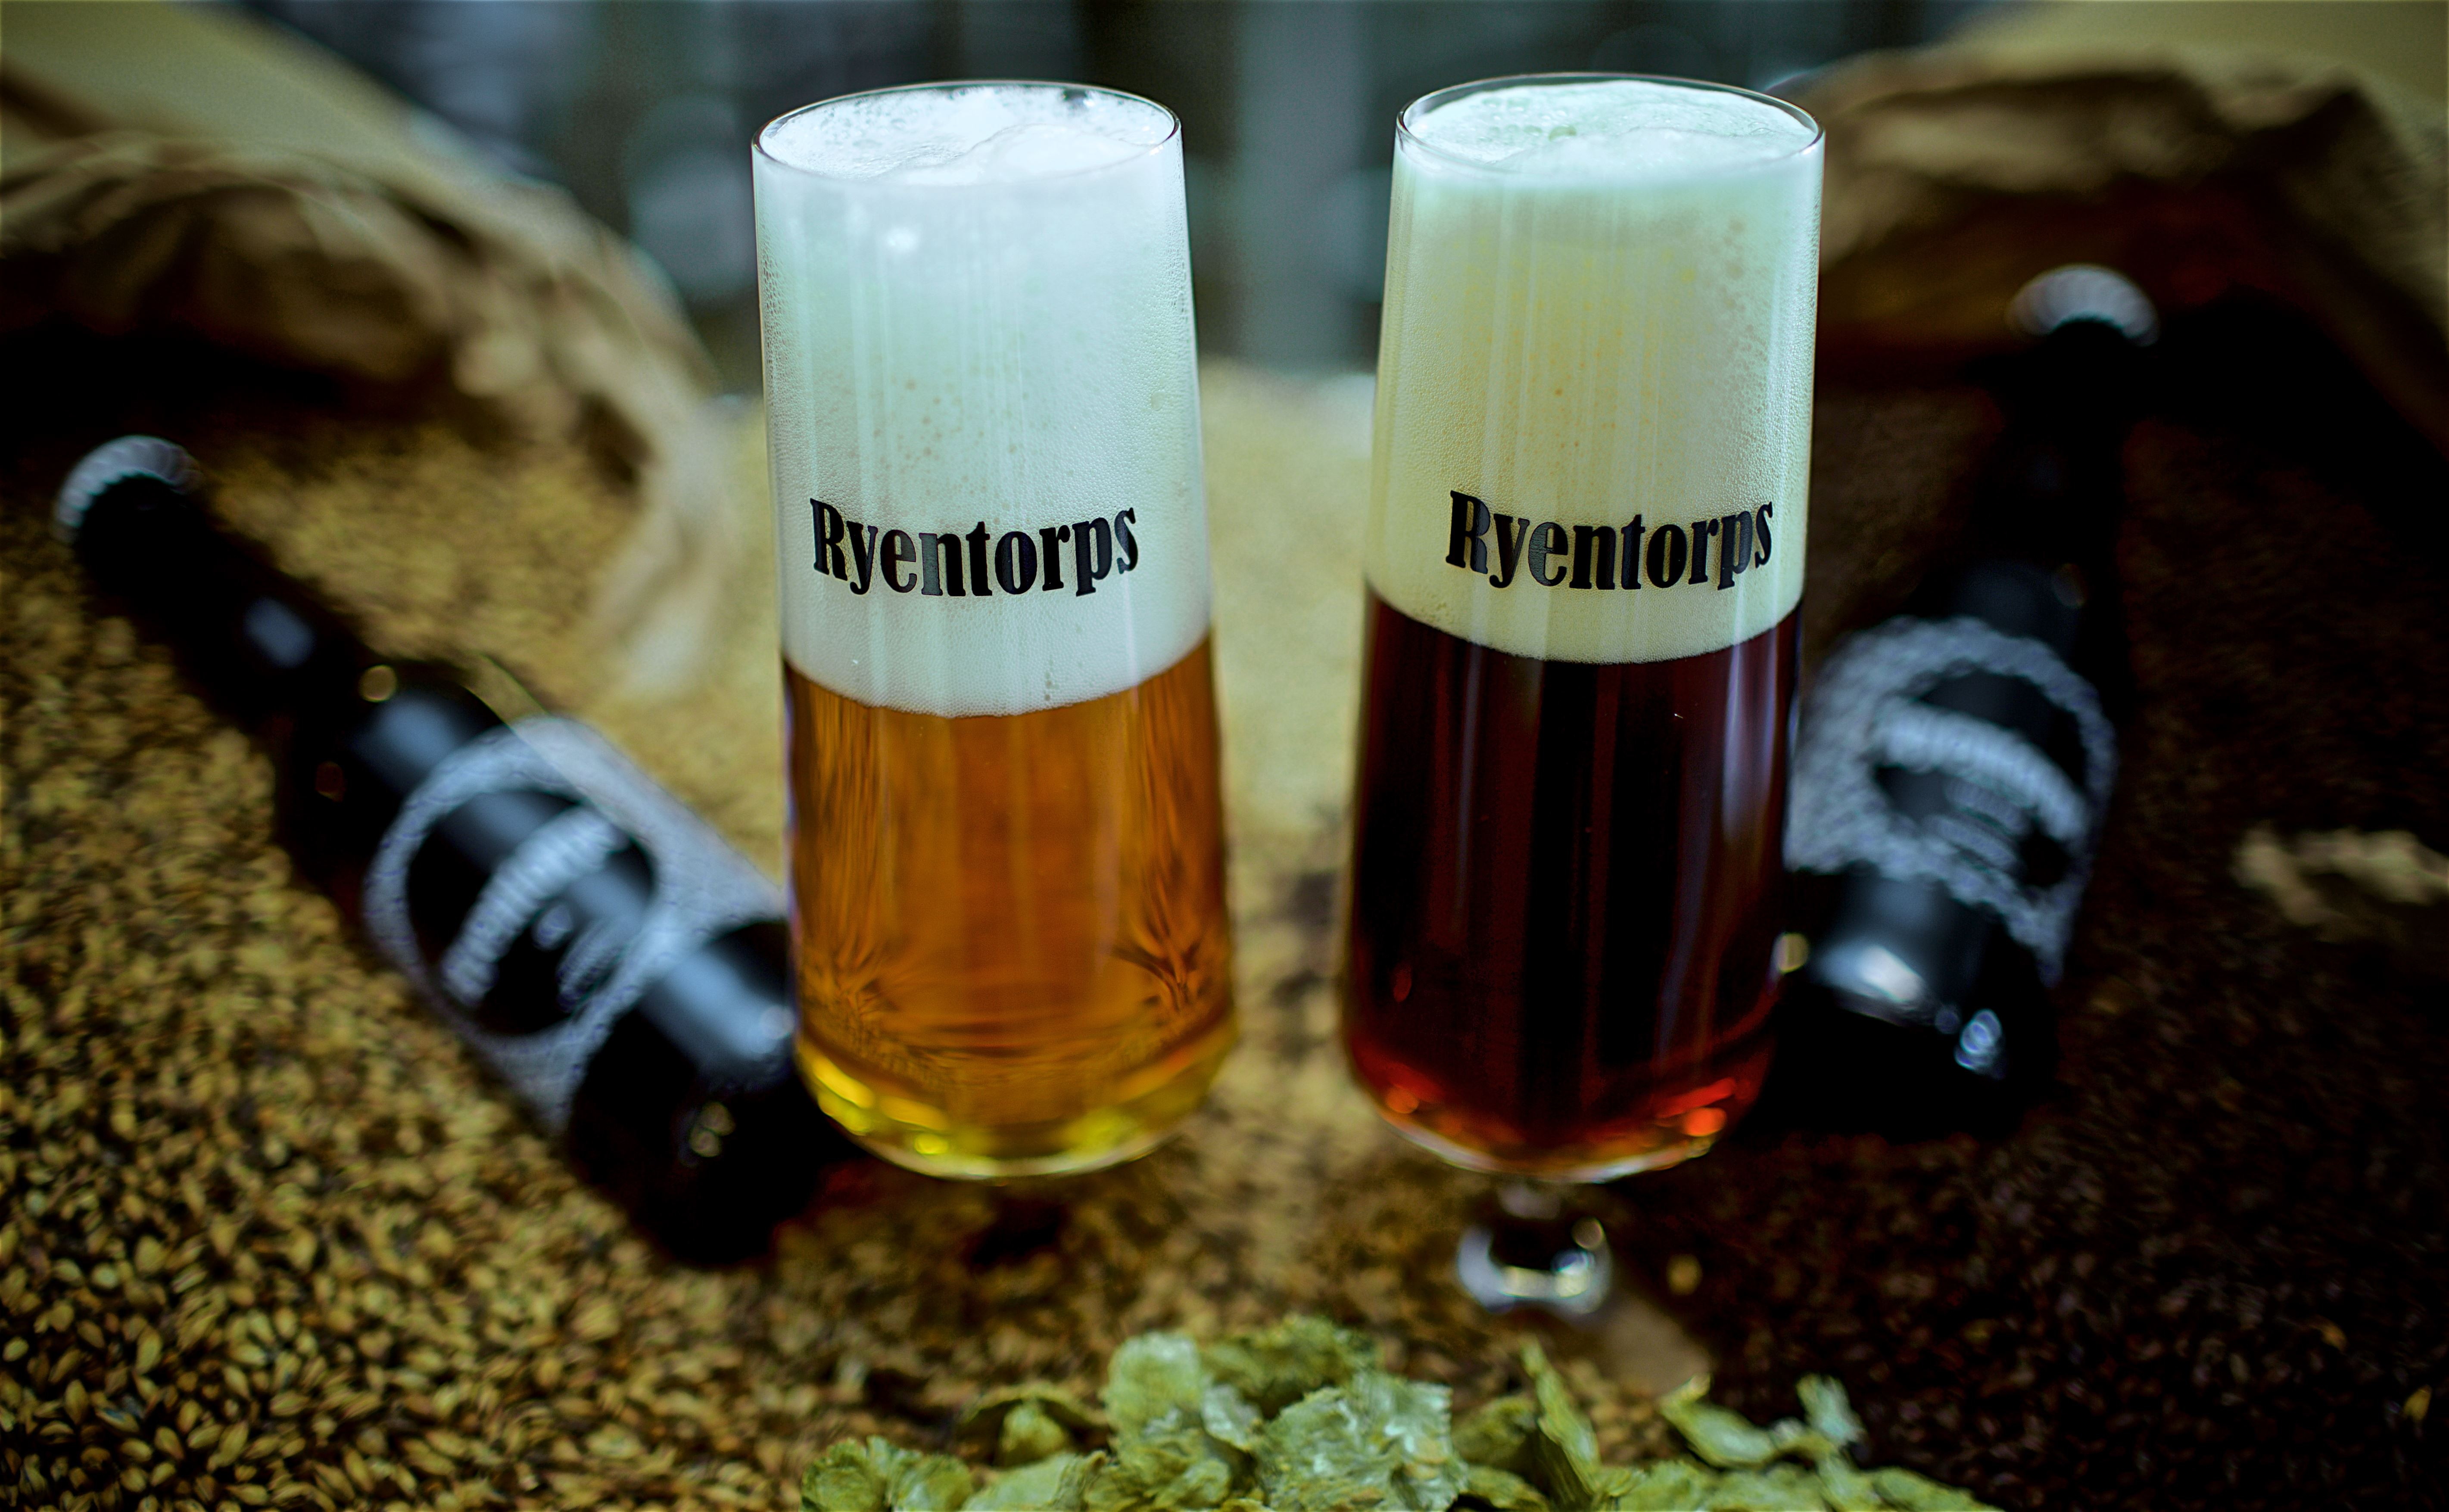 Ryentorps Bryggeri